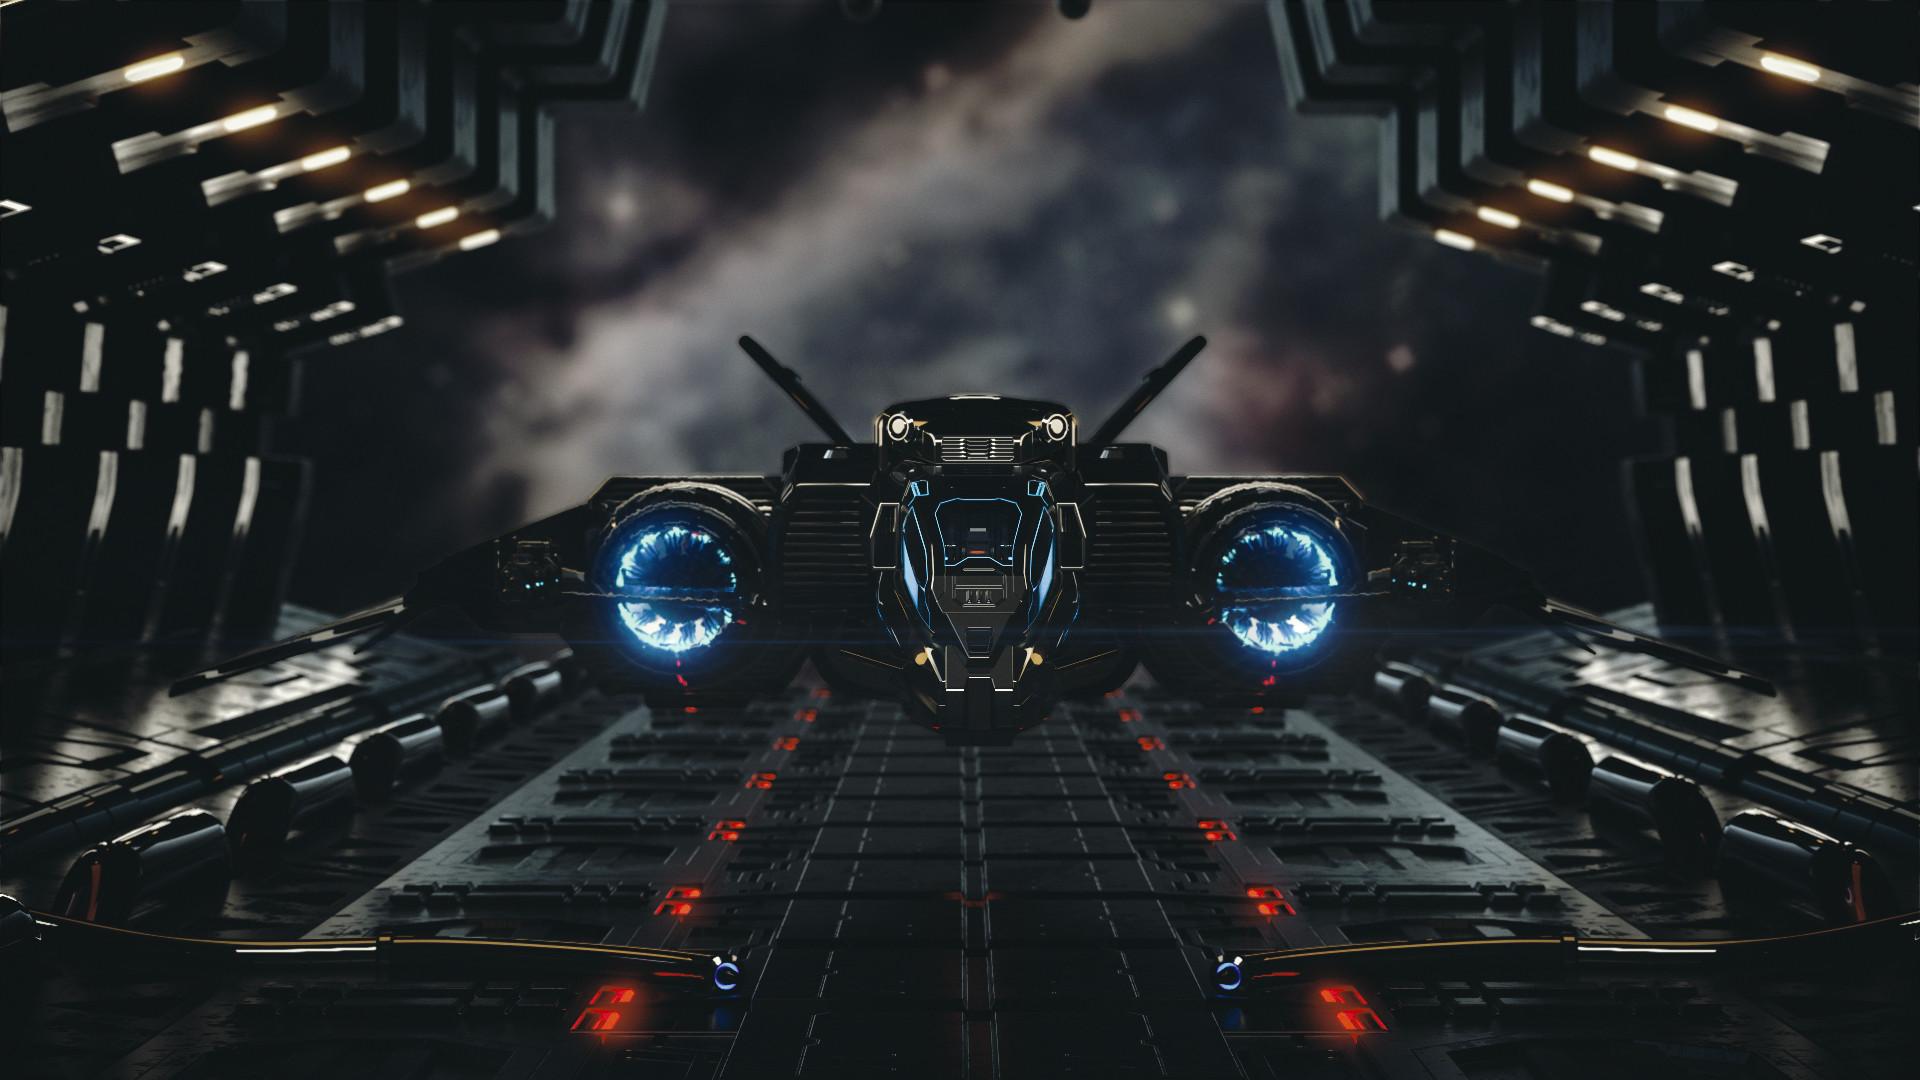 The Reaper - aka Sabre - Harsurface Spaceship